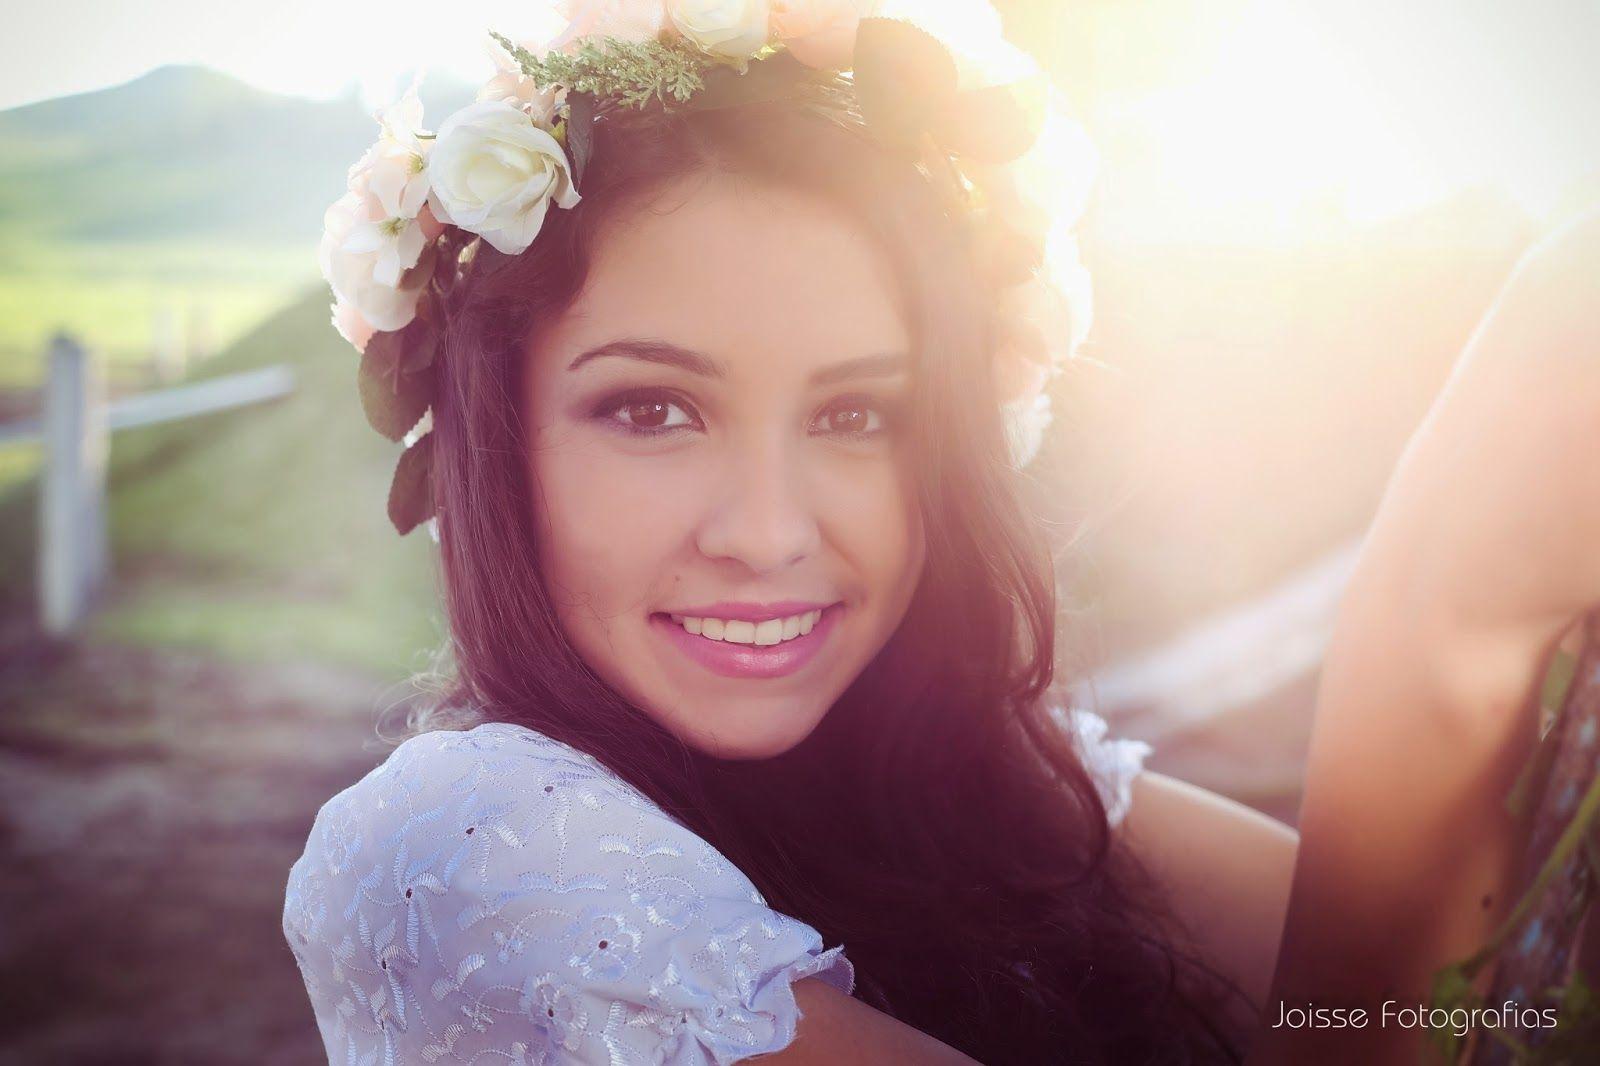 Joisse Lara Fotografias: Book 15 anos Juliana